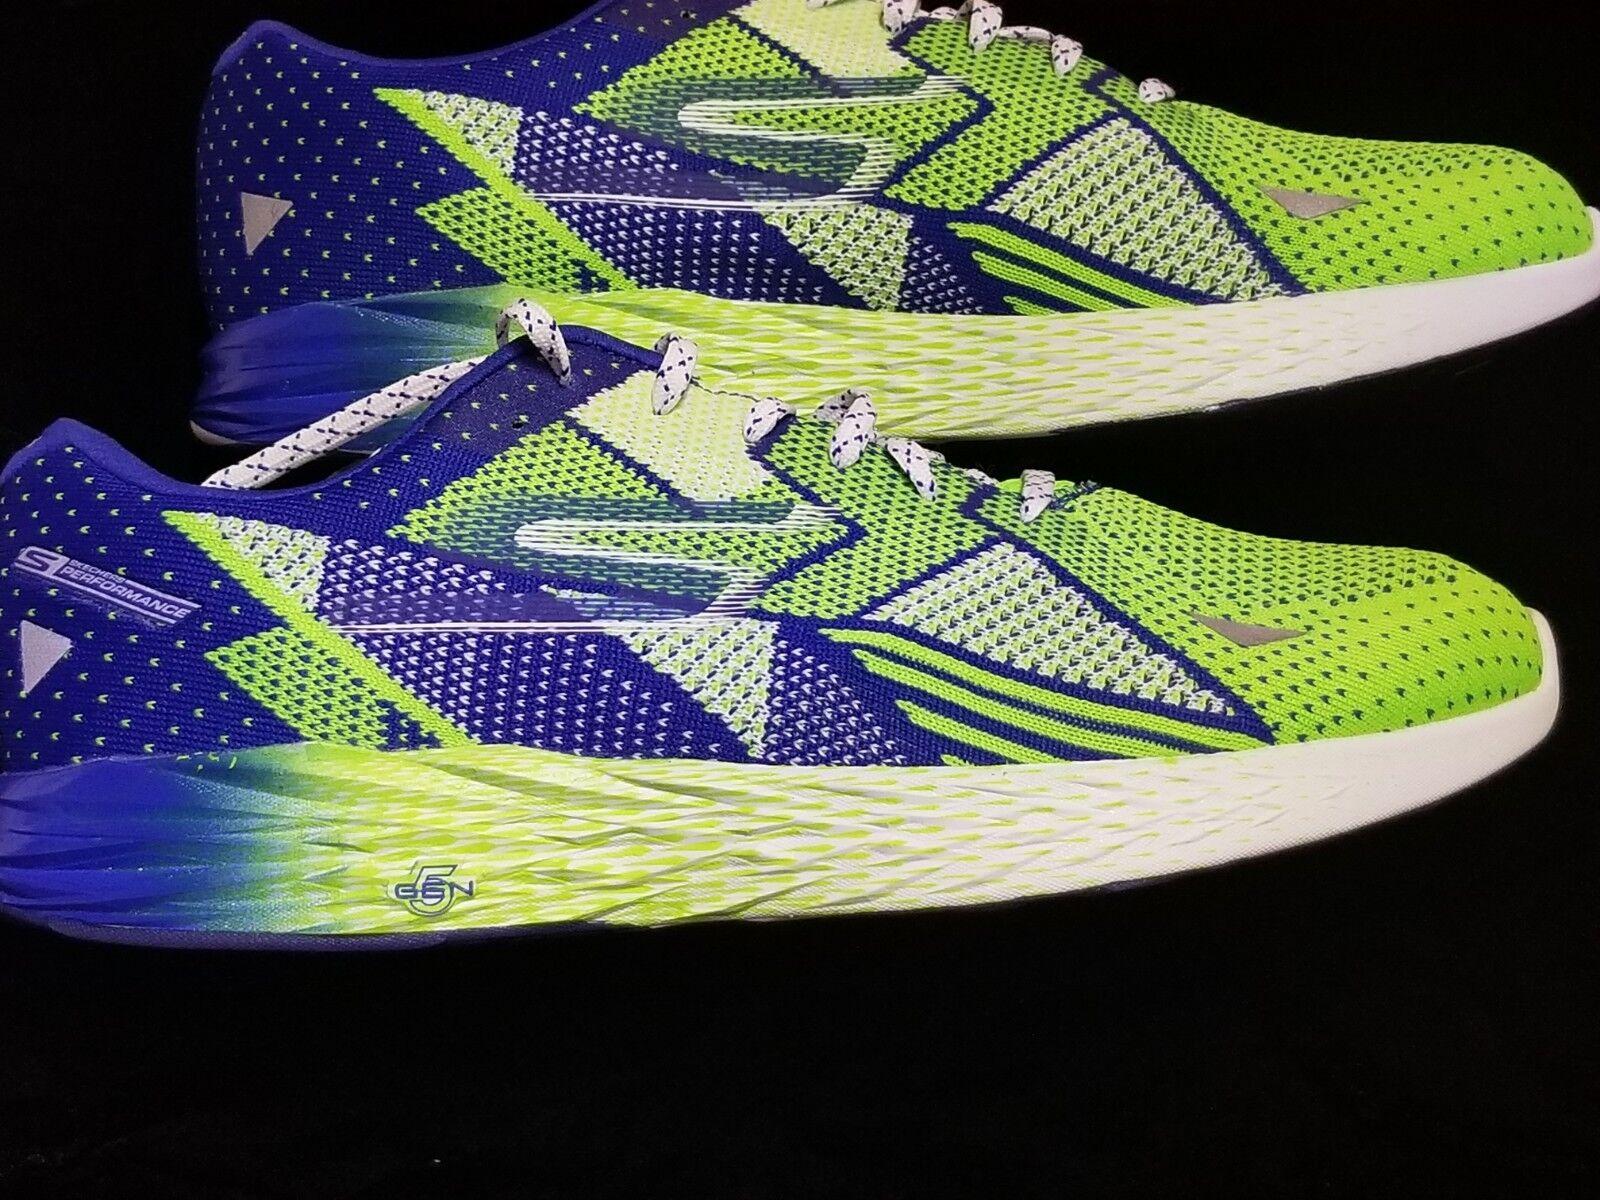 Brand New Skechers Go Meb Razor Green blueE Running shoes - Mens Size 13